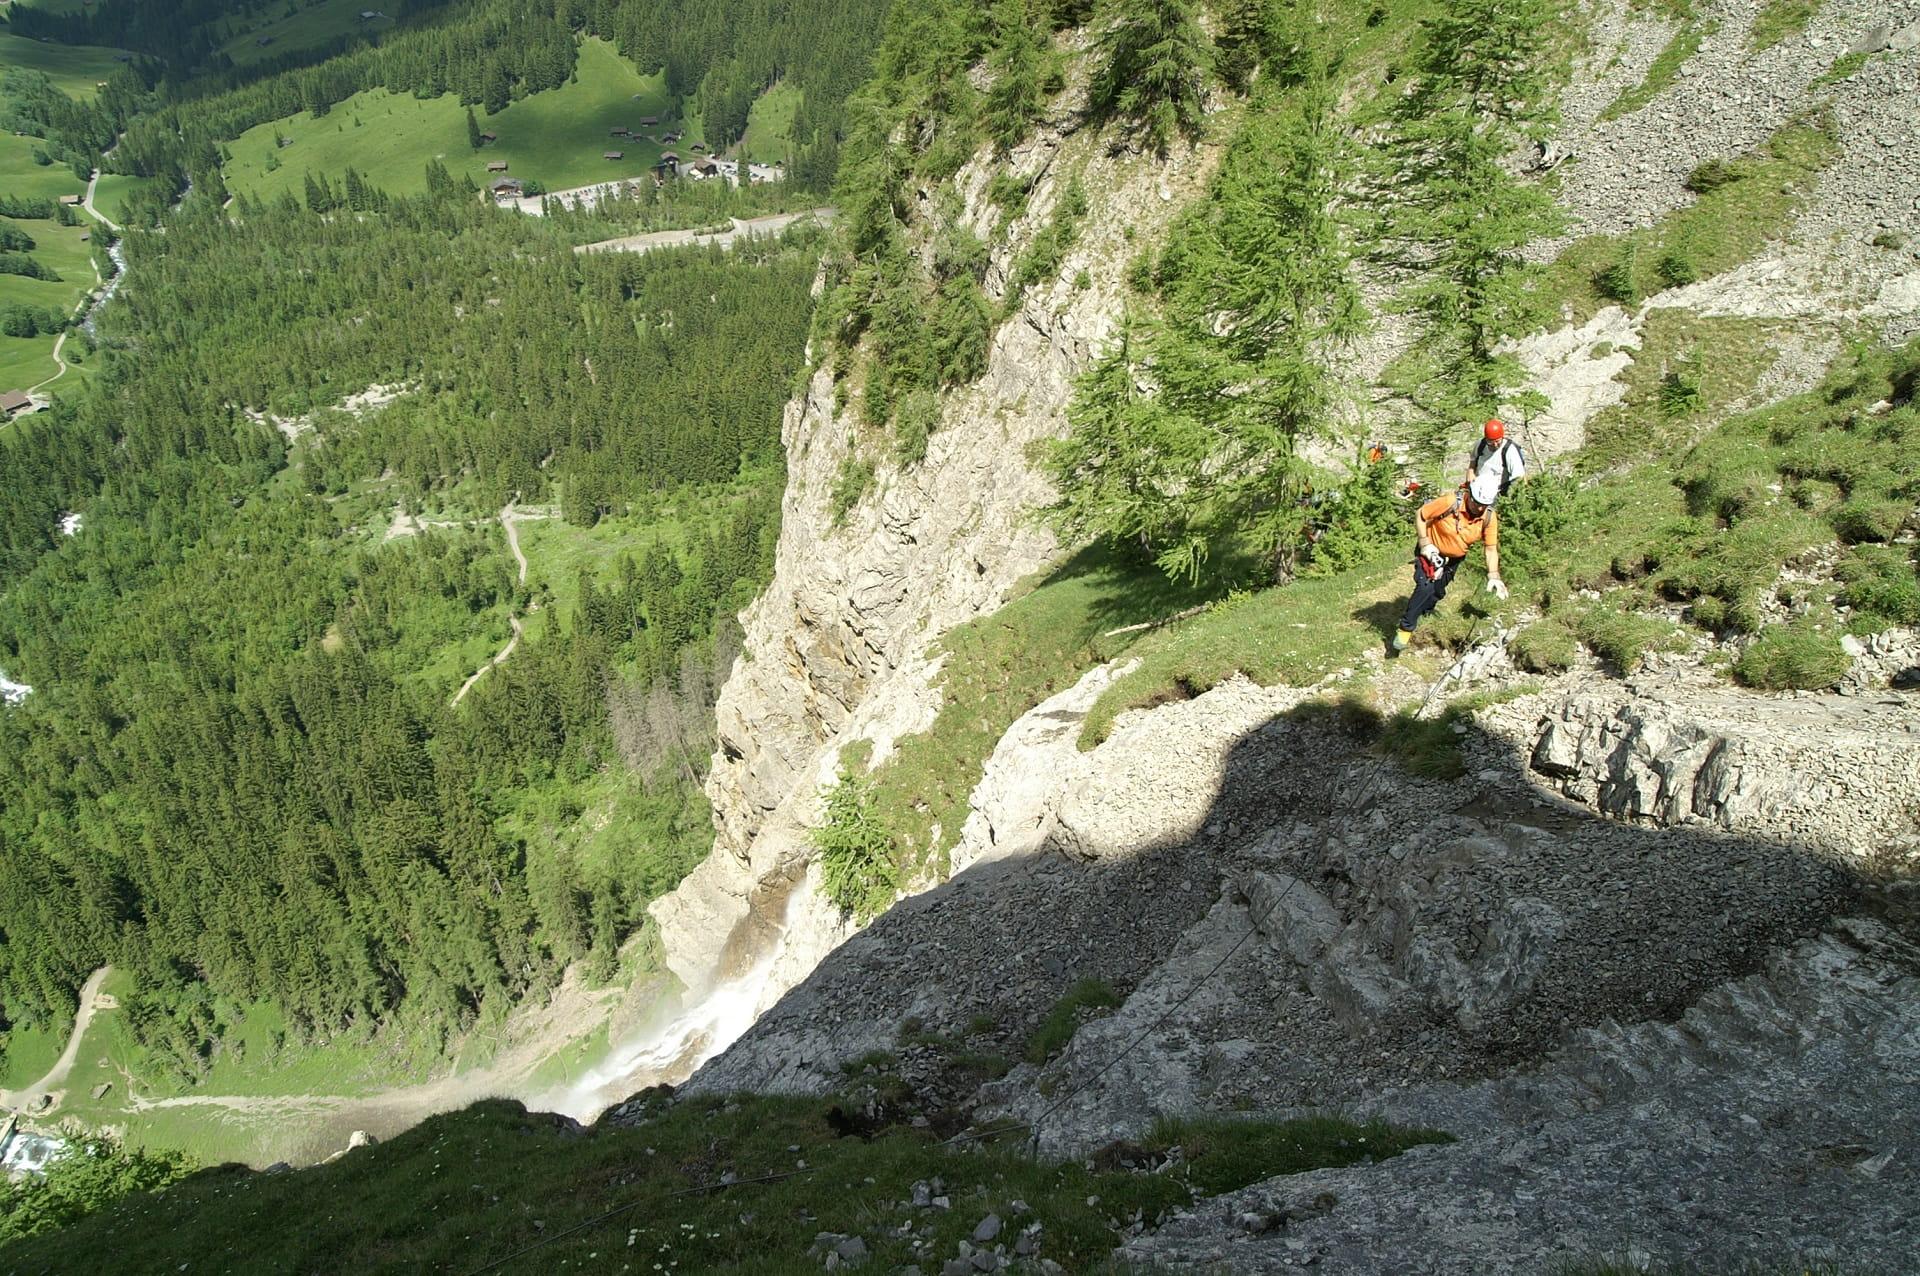 Klettersteig Engstligenalp : Engstligenalp klettersteig chäligang ausflüge